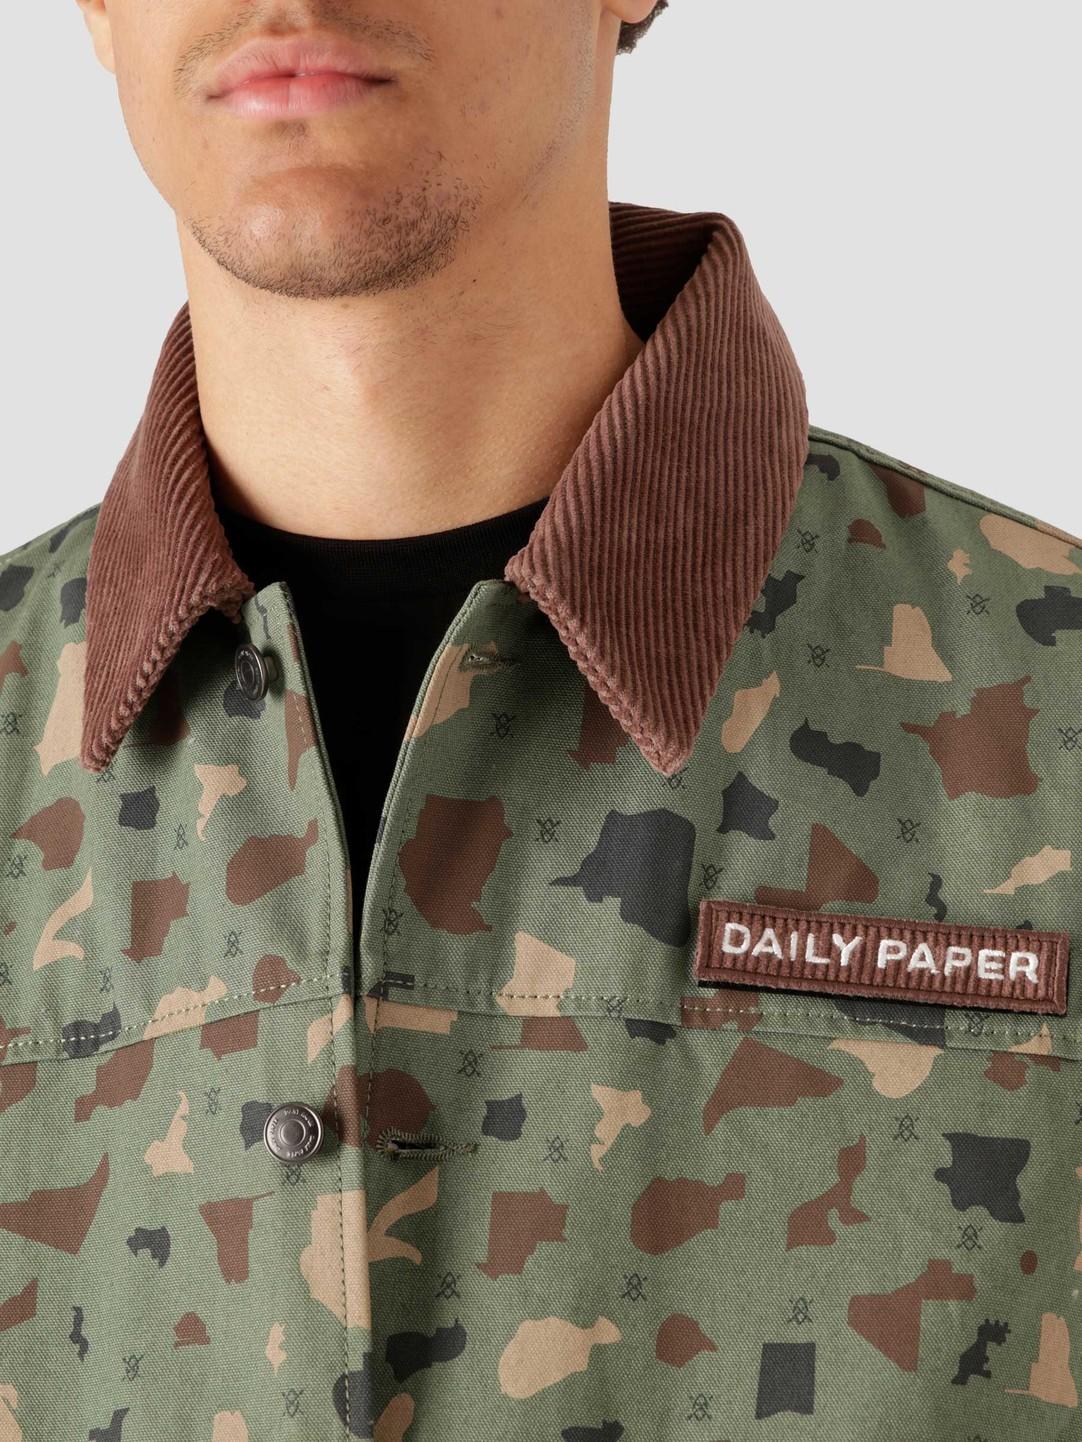 Daily Paper Daily Paper Recomo Coach Green Camo 2113039